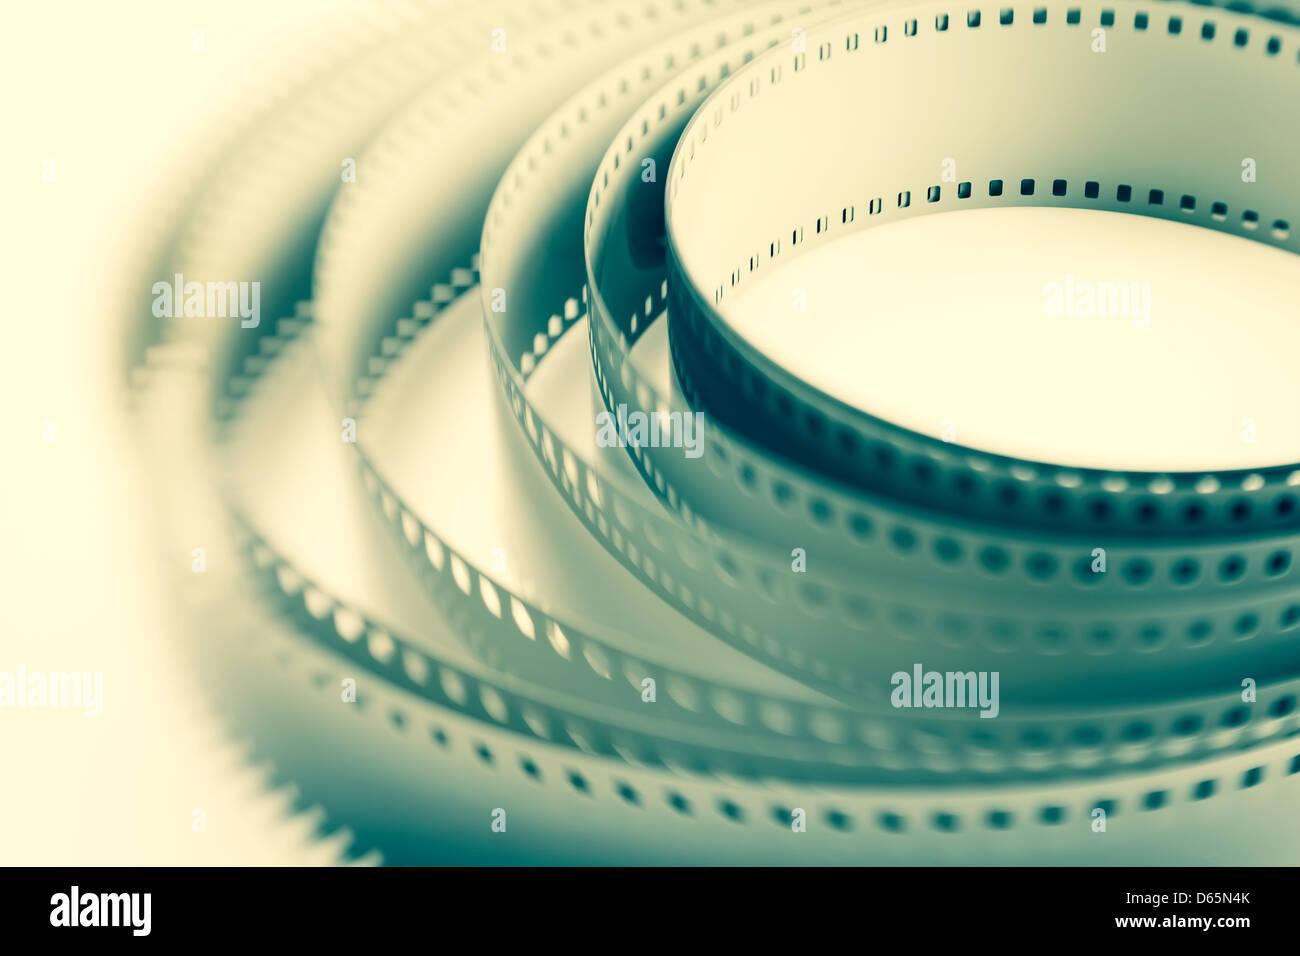 Filmina roll dynamic full frame closeup Immagini Stock